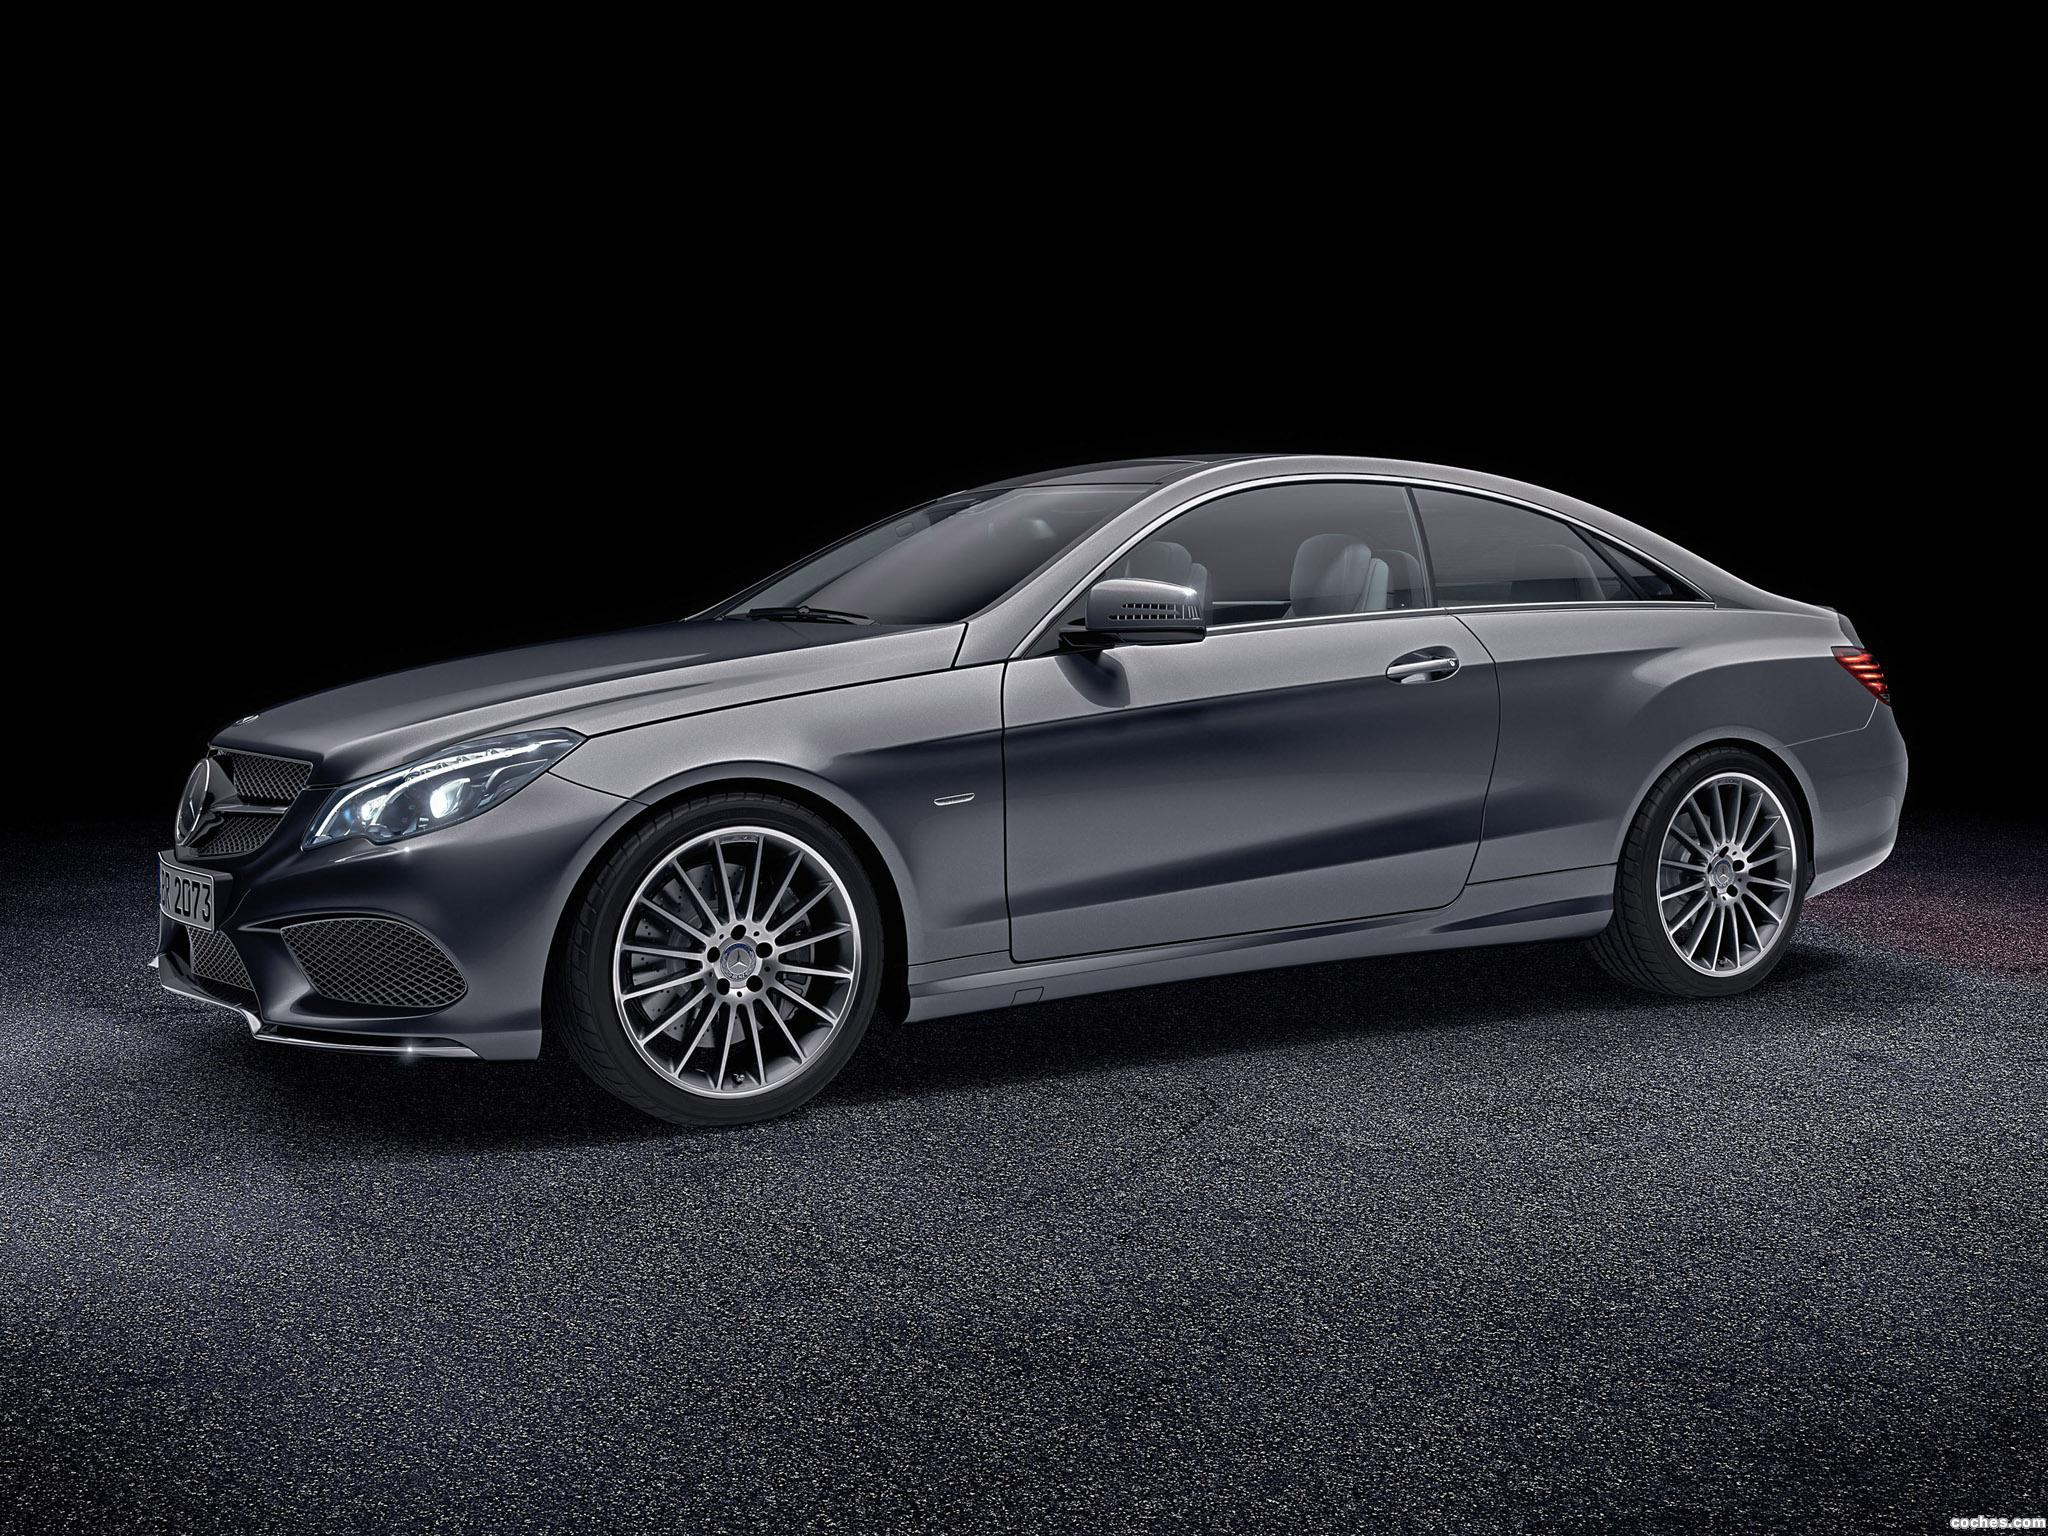 mercedes_e500-coupe-v8-edition-c207-2015_r2.jpg